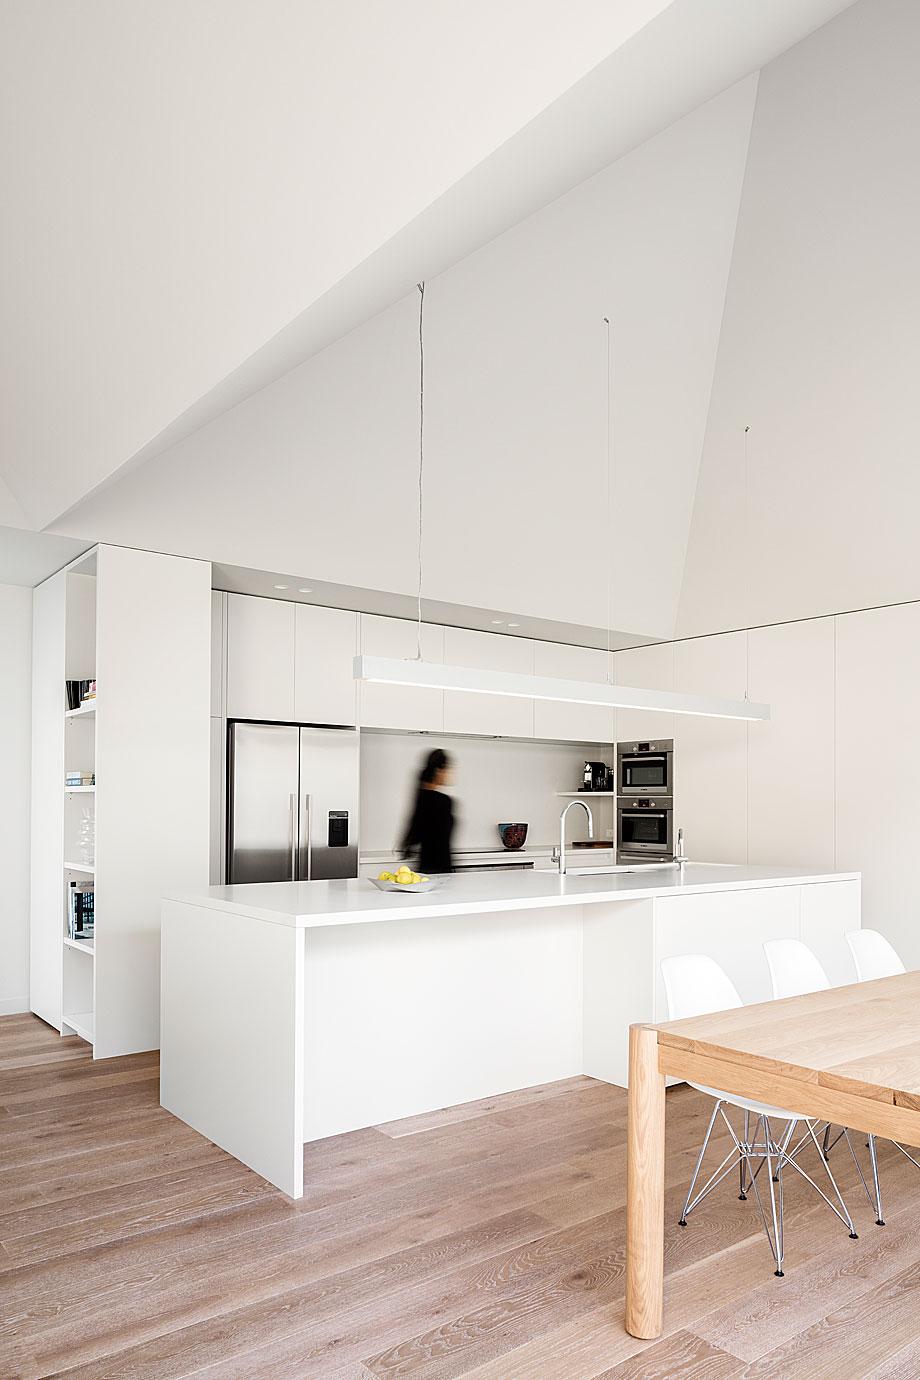 vivienda-ssk-robert-davidov-architectes (2)